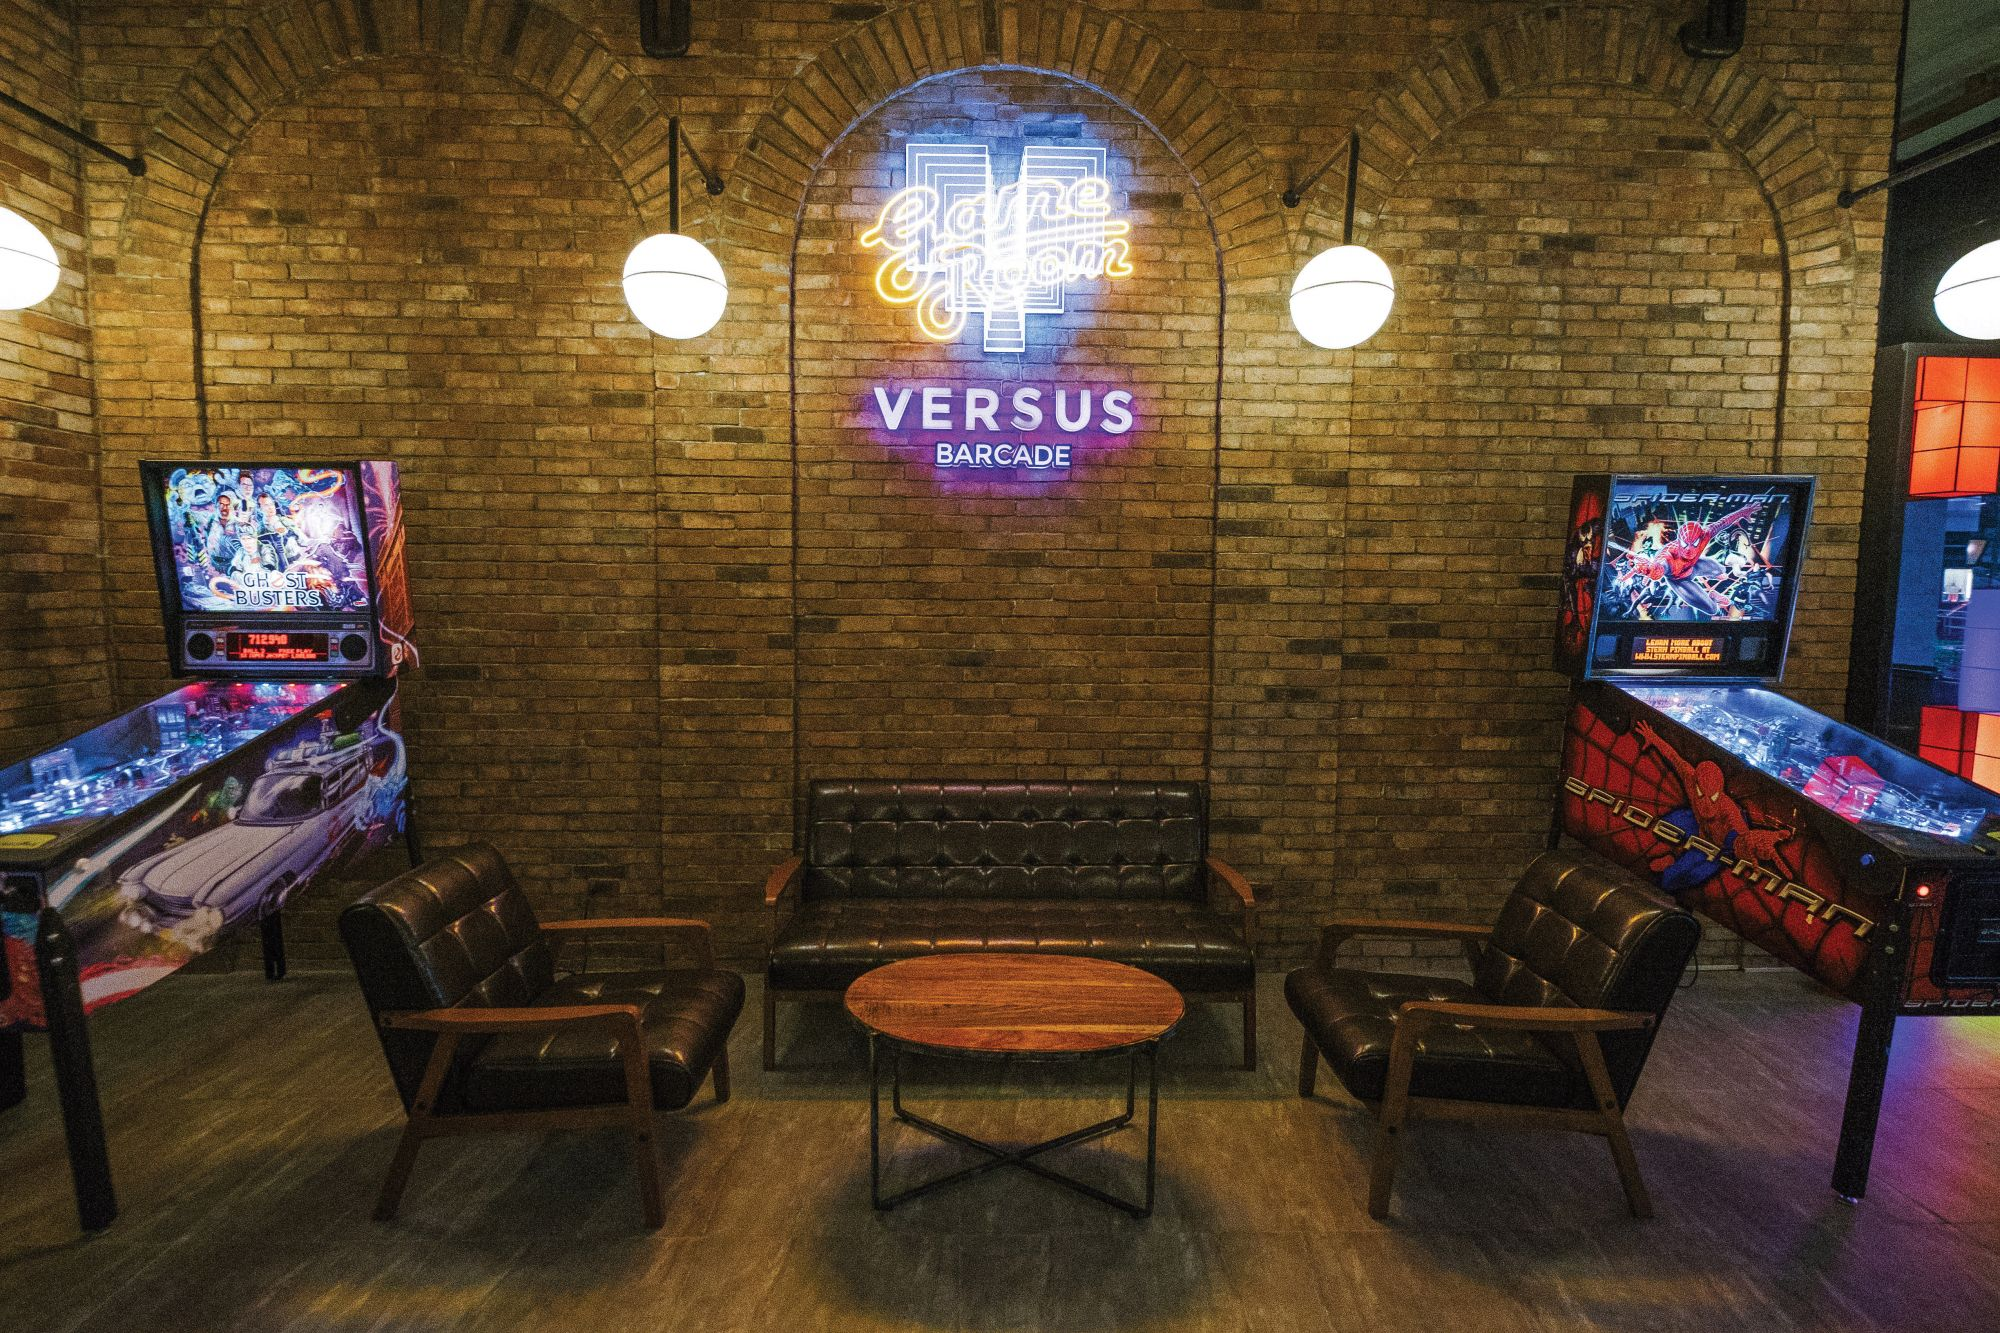 New Review: Versus Barcade